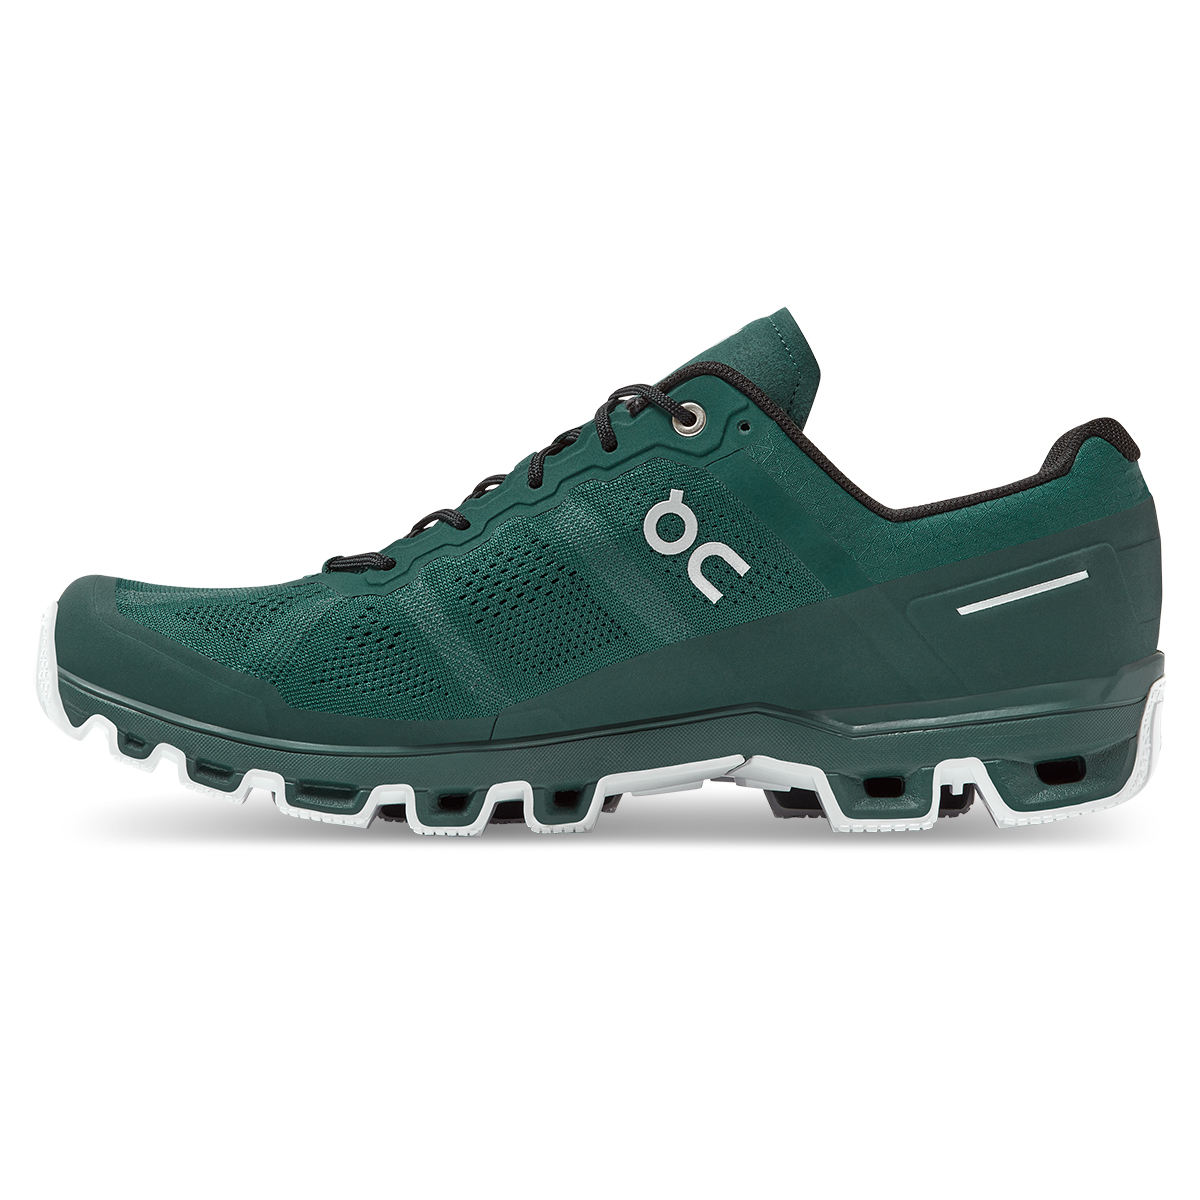 Men's On Cloudventure Running Shoe - Color: Evergreen/White - Size: 7 - Width: Regular, Evergreen/White, large, image 2